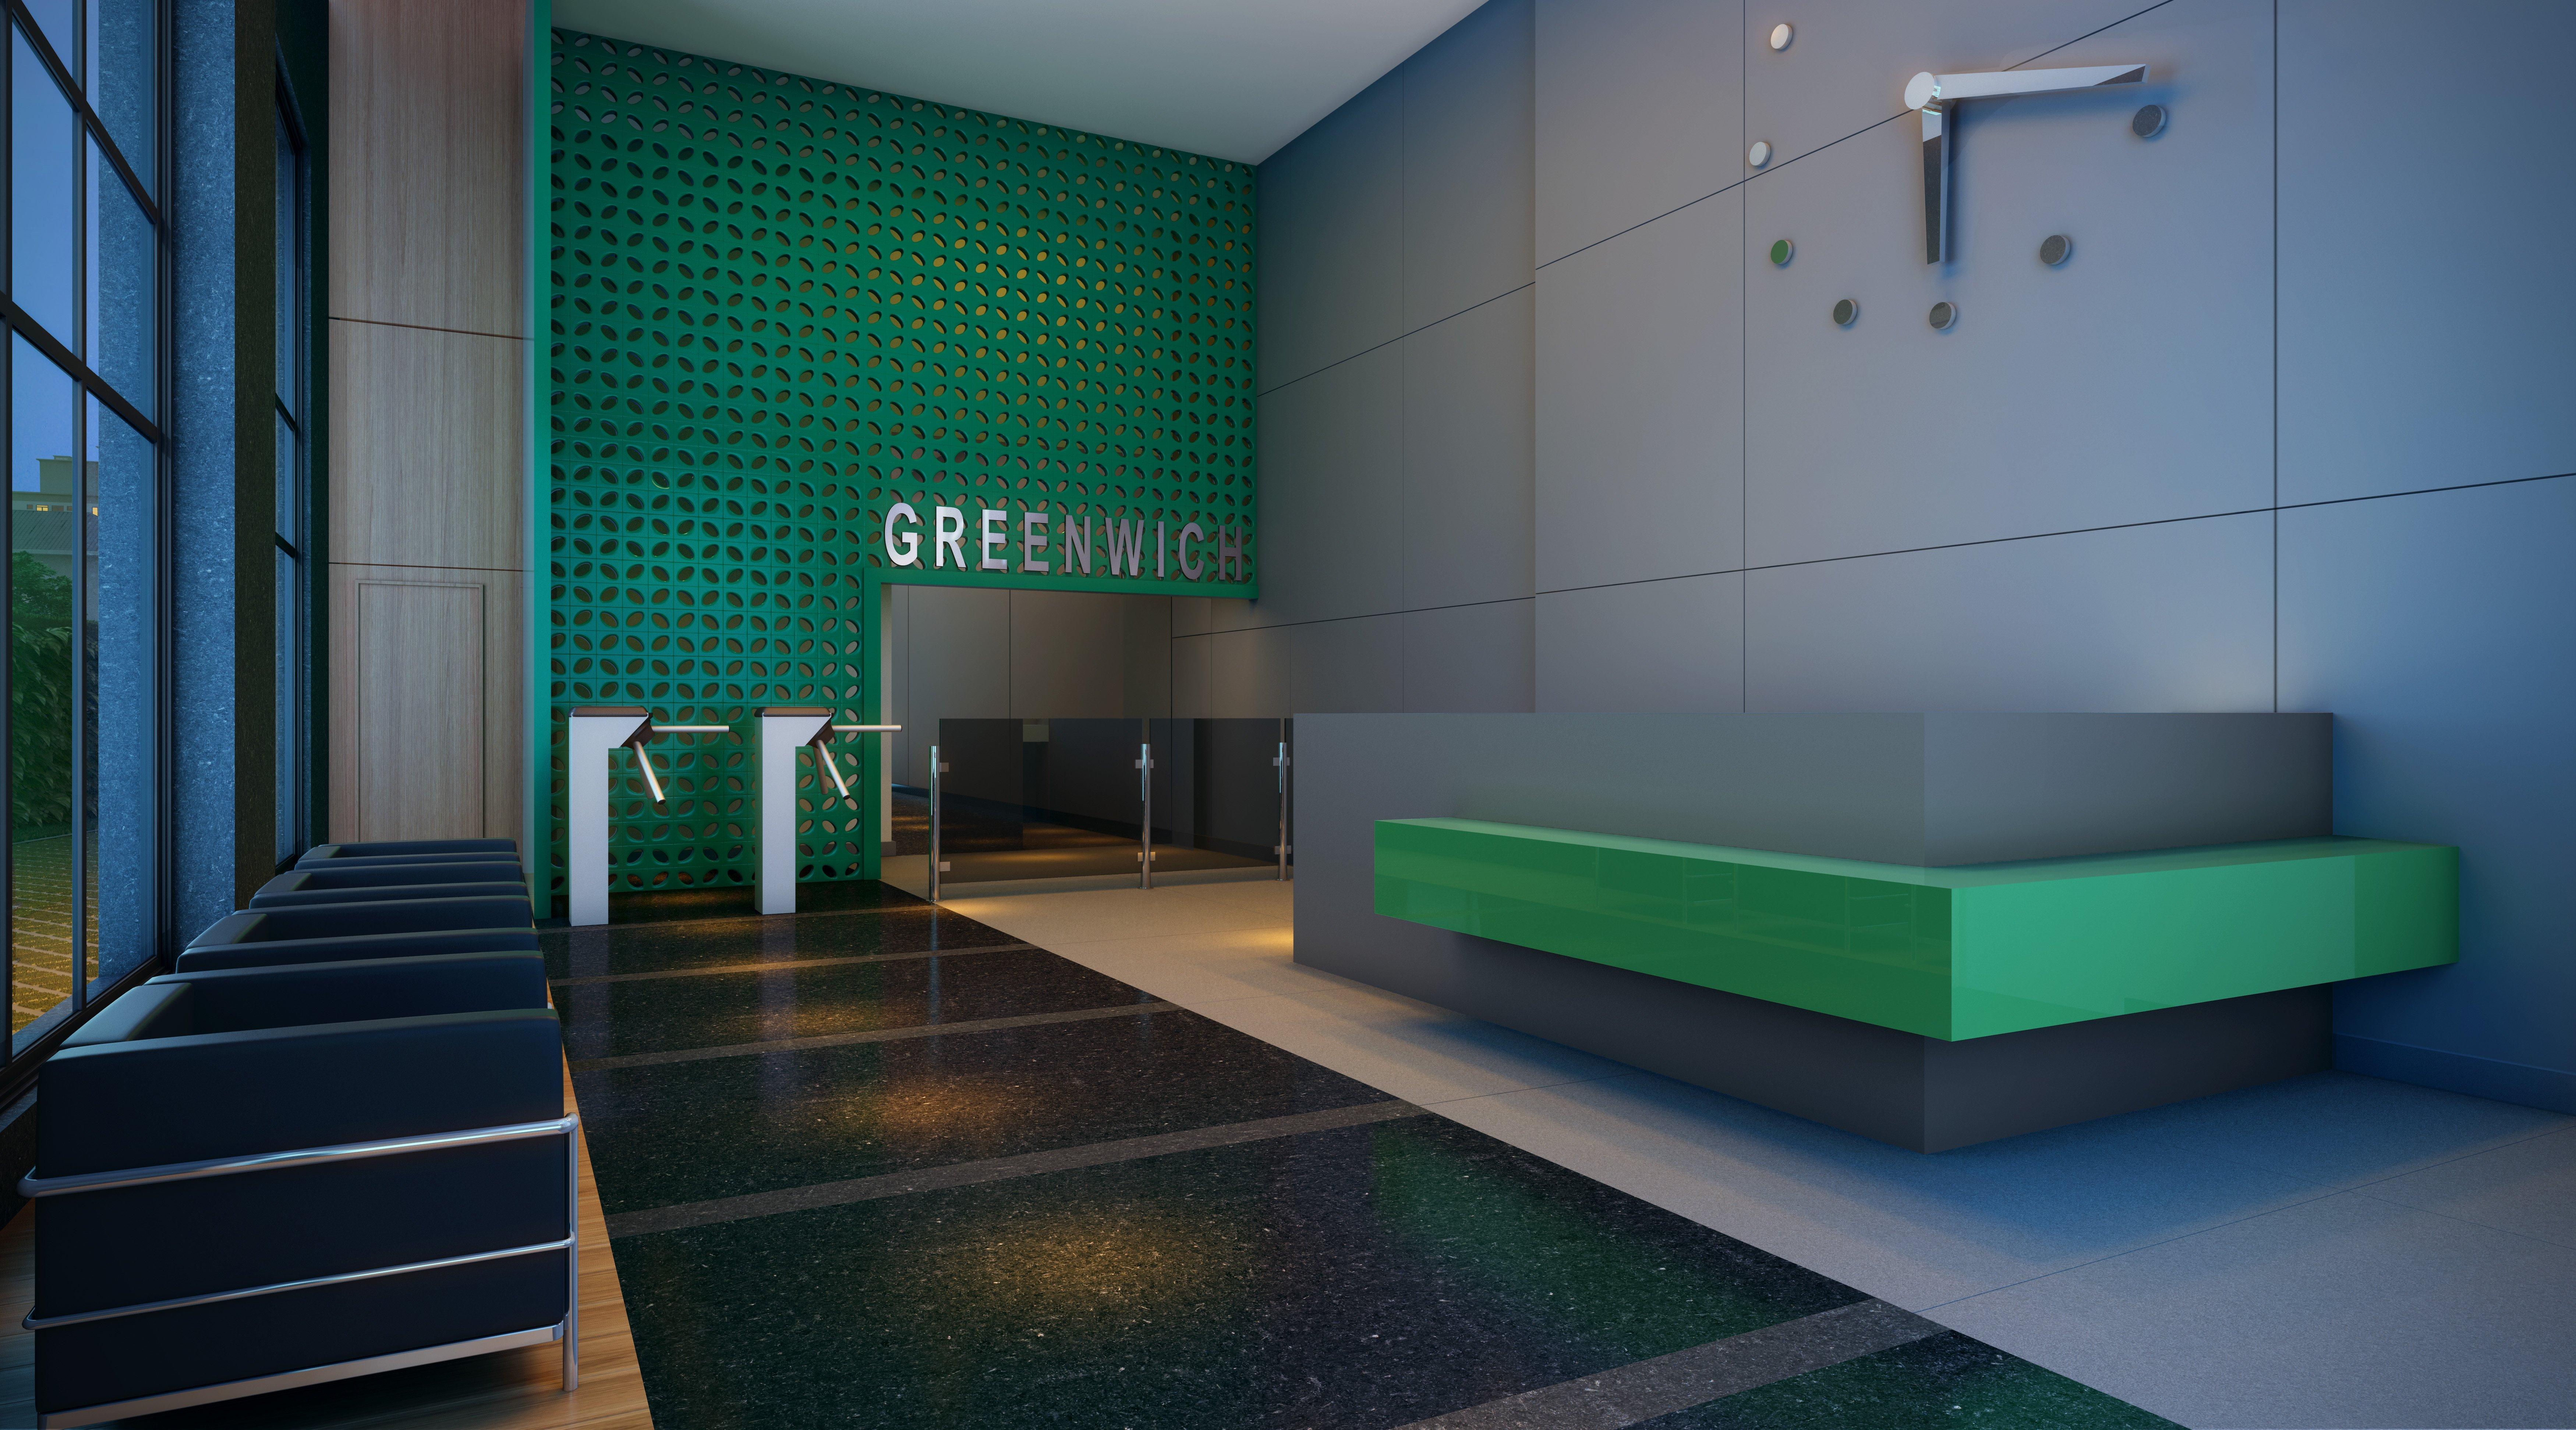 Greenwich - Hall